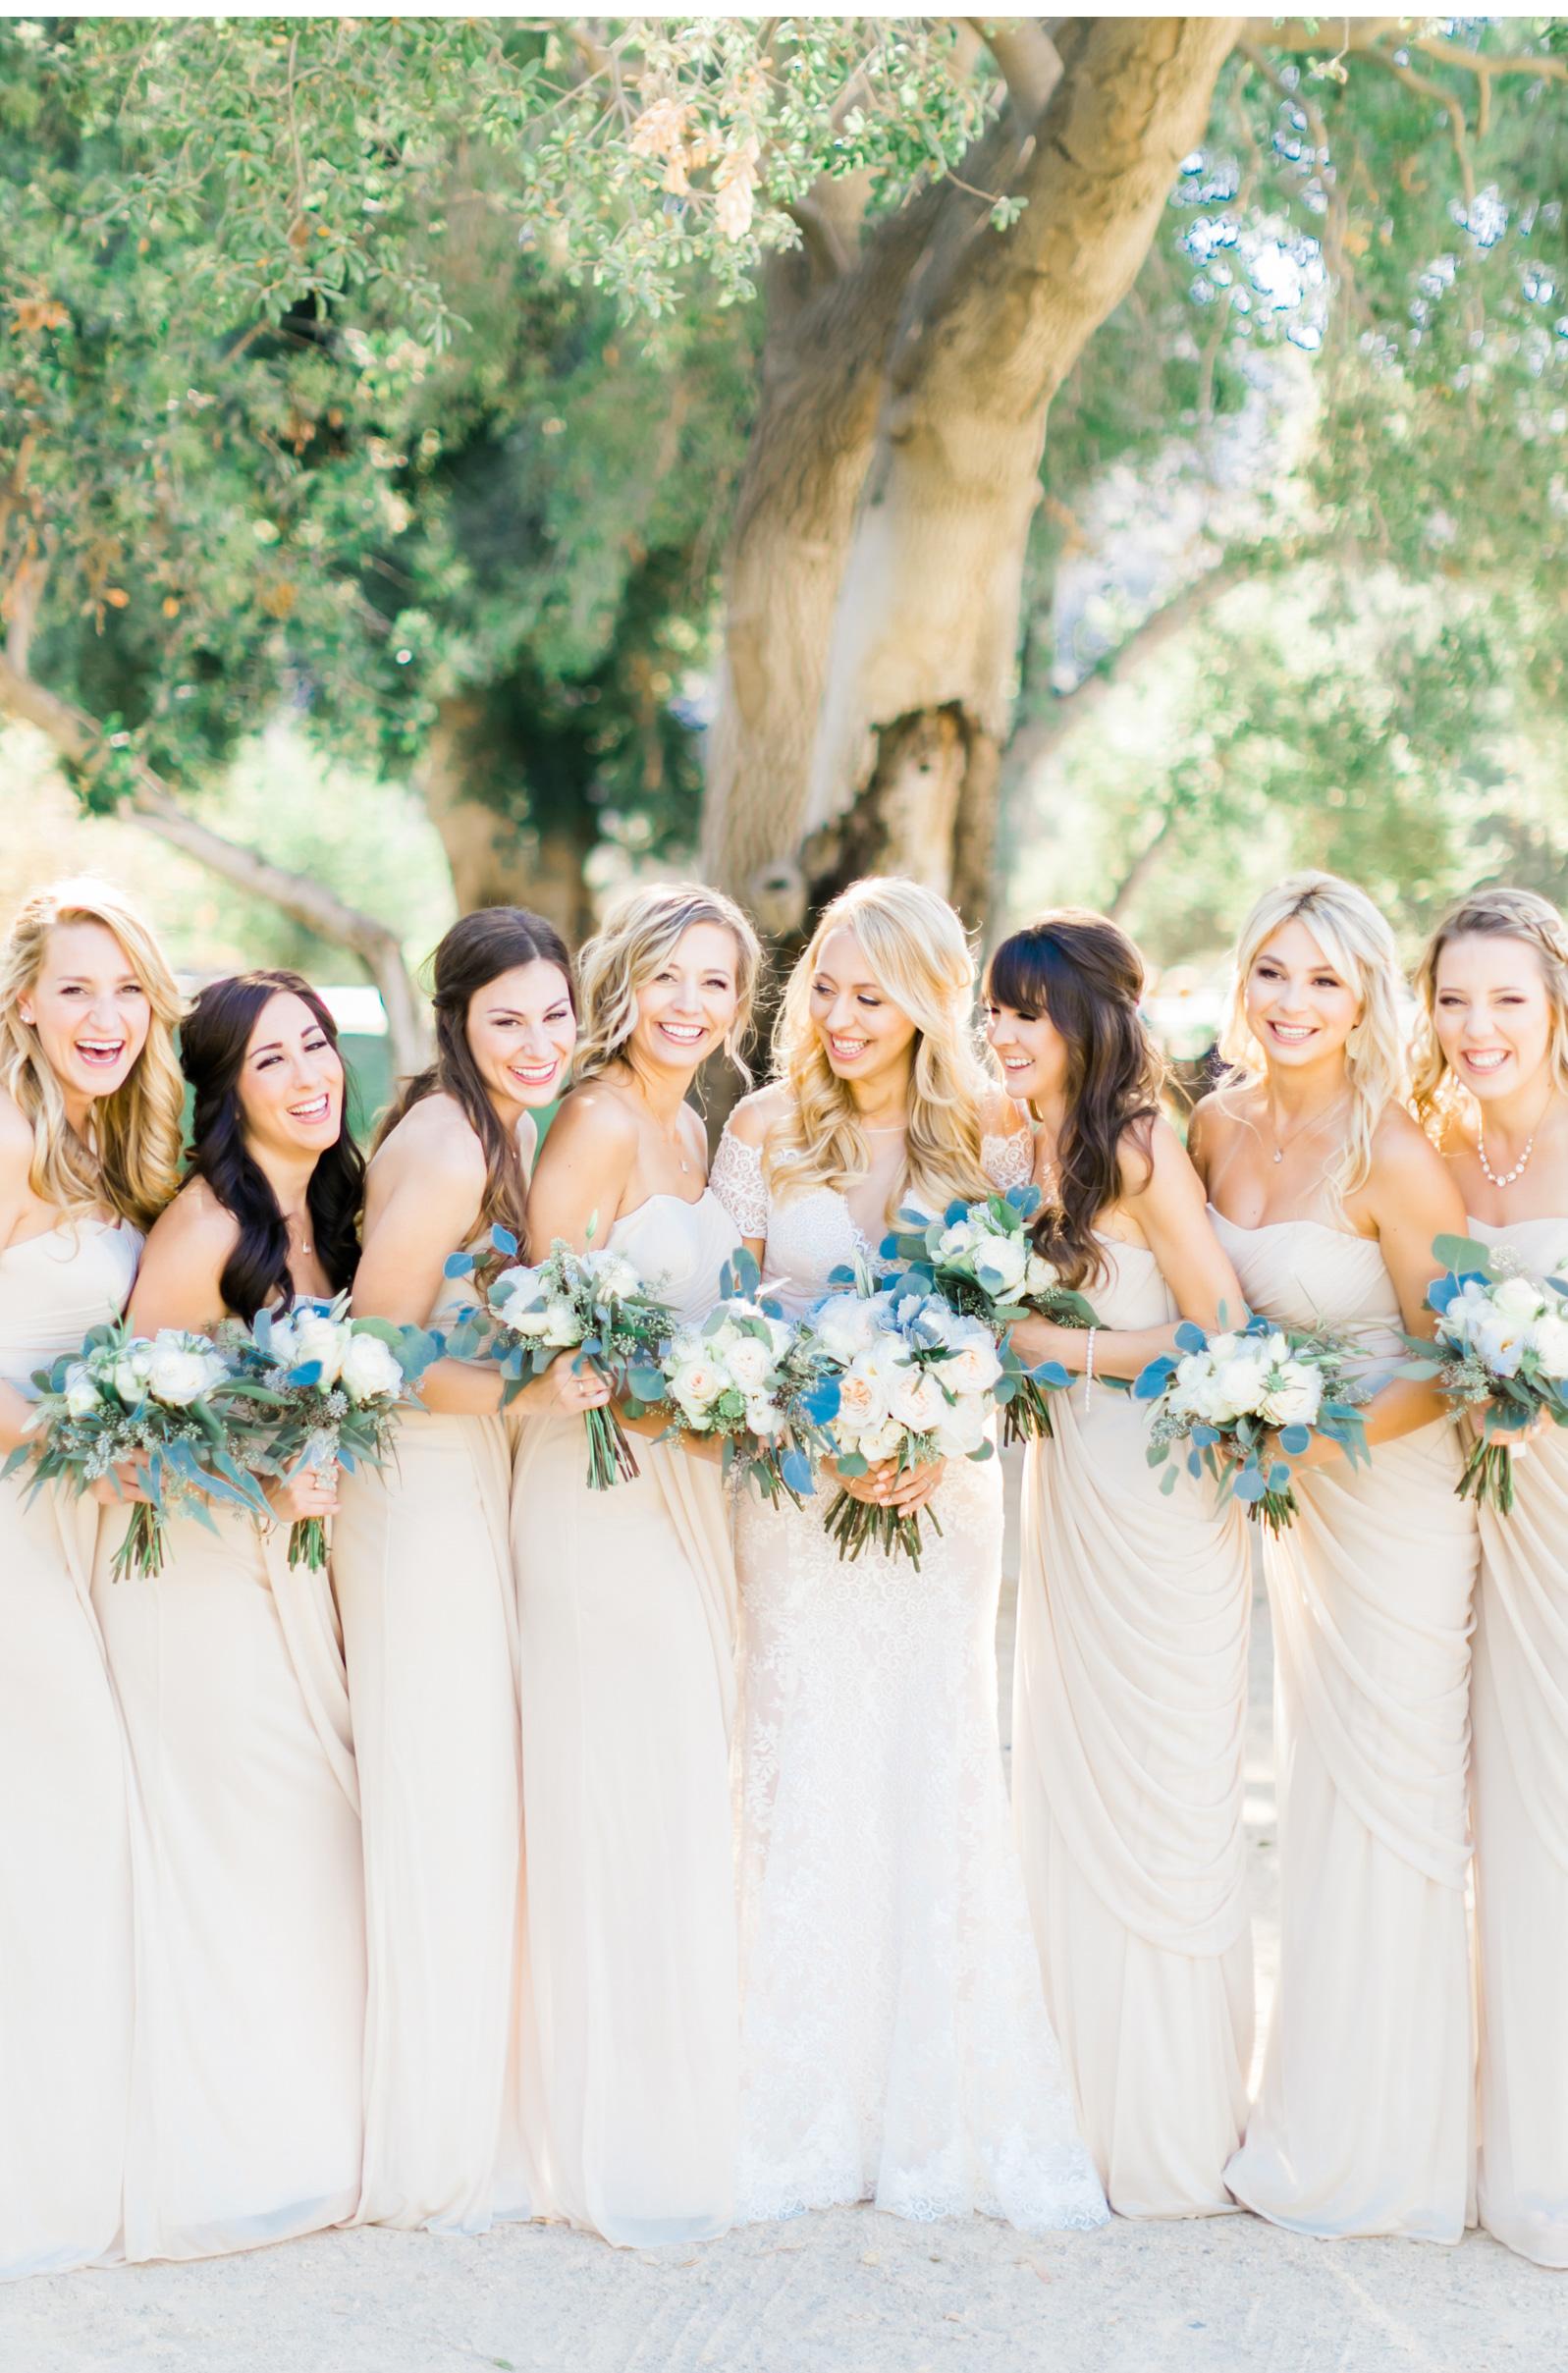 Temecula-Wedding-Photographer-Style-Me-Pretty-Natalie-Schutt-Photography_11.jpg